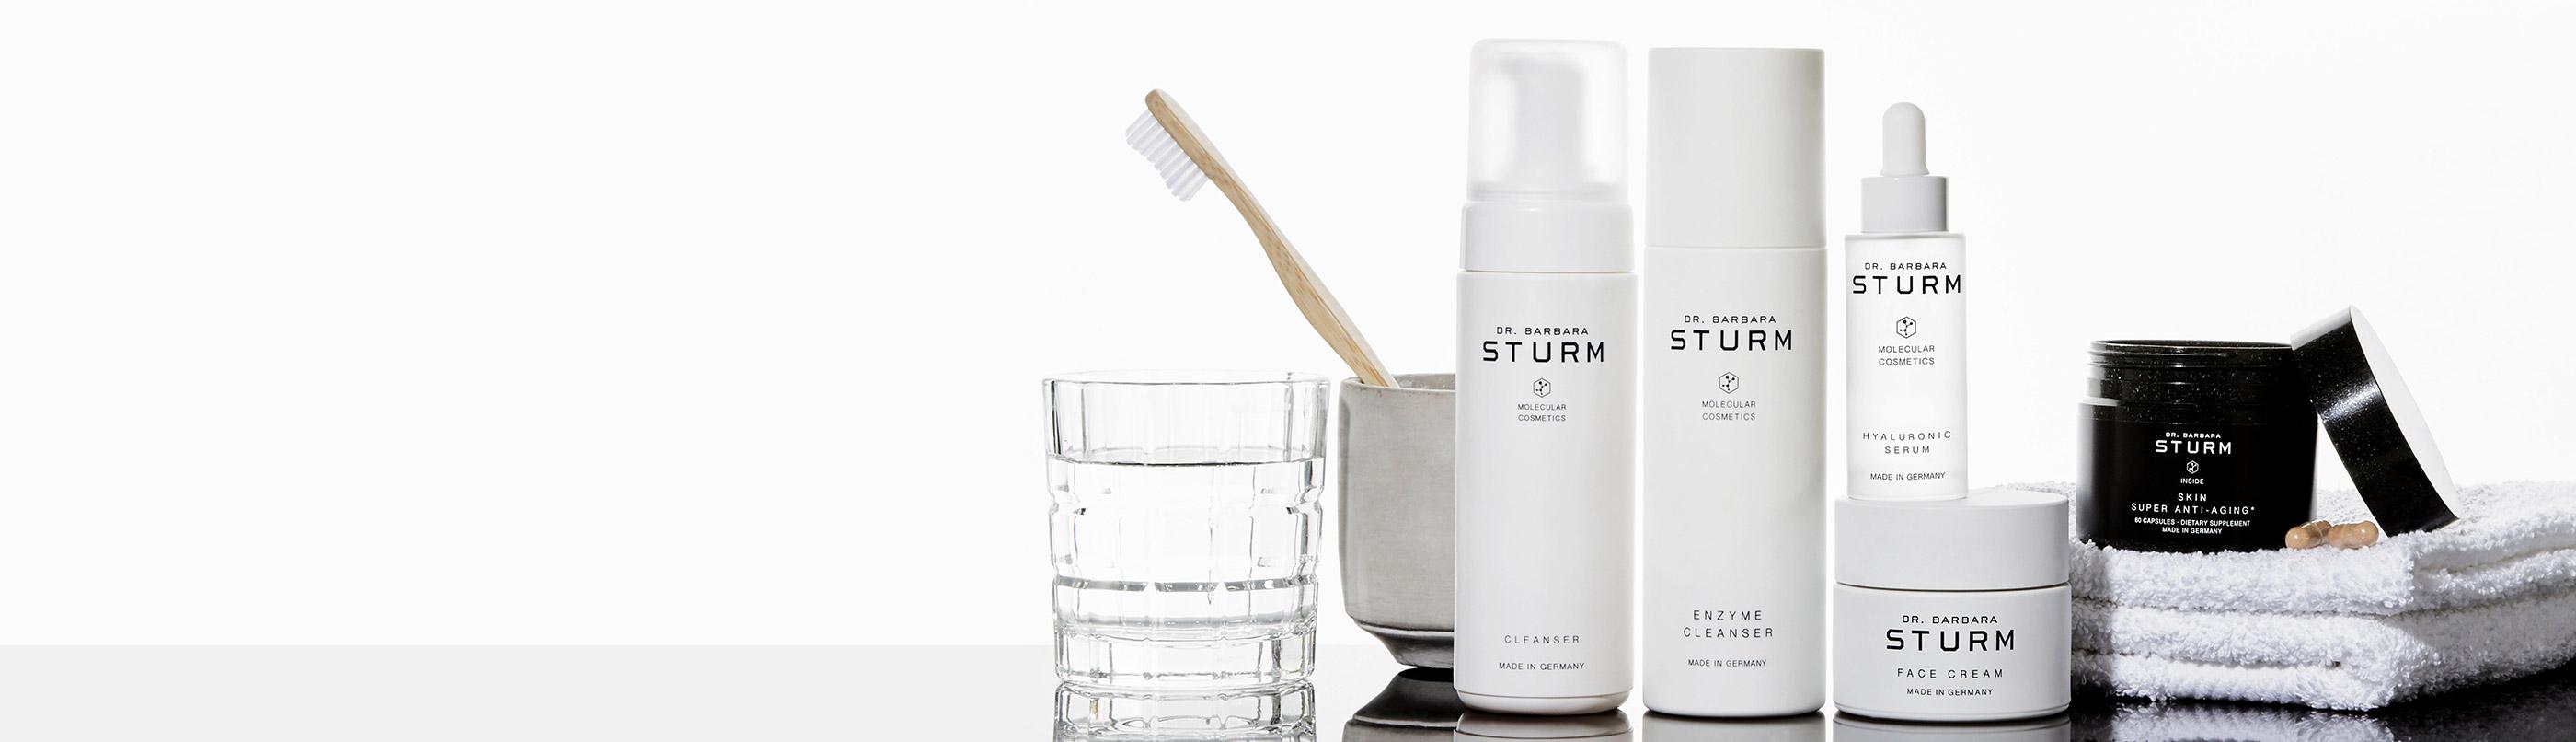 sturmglow-essentials-set.jpg